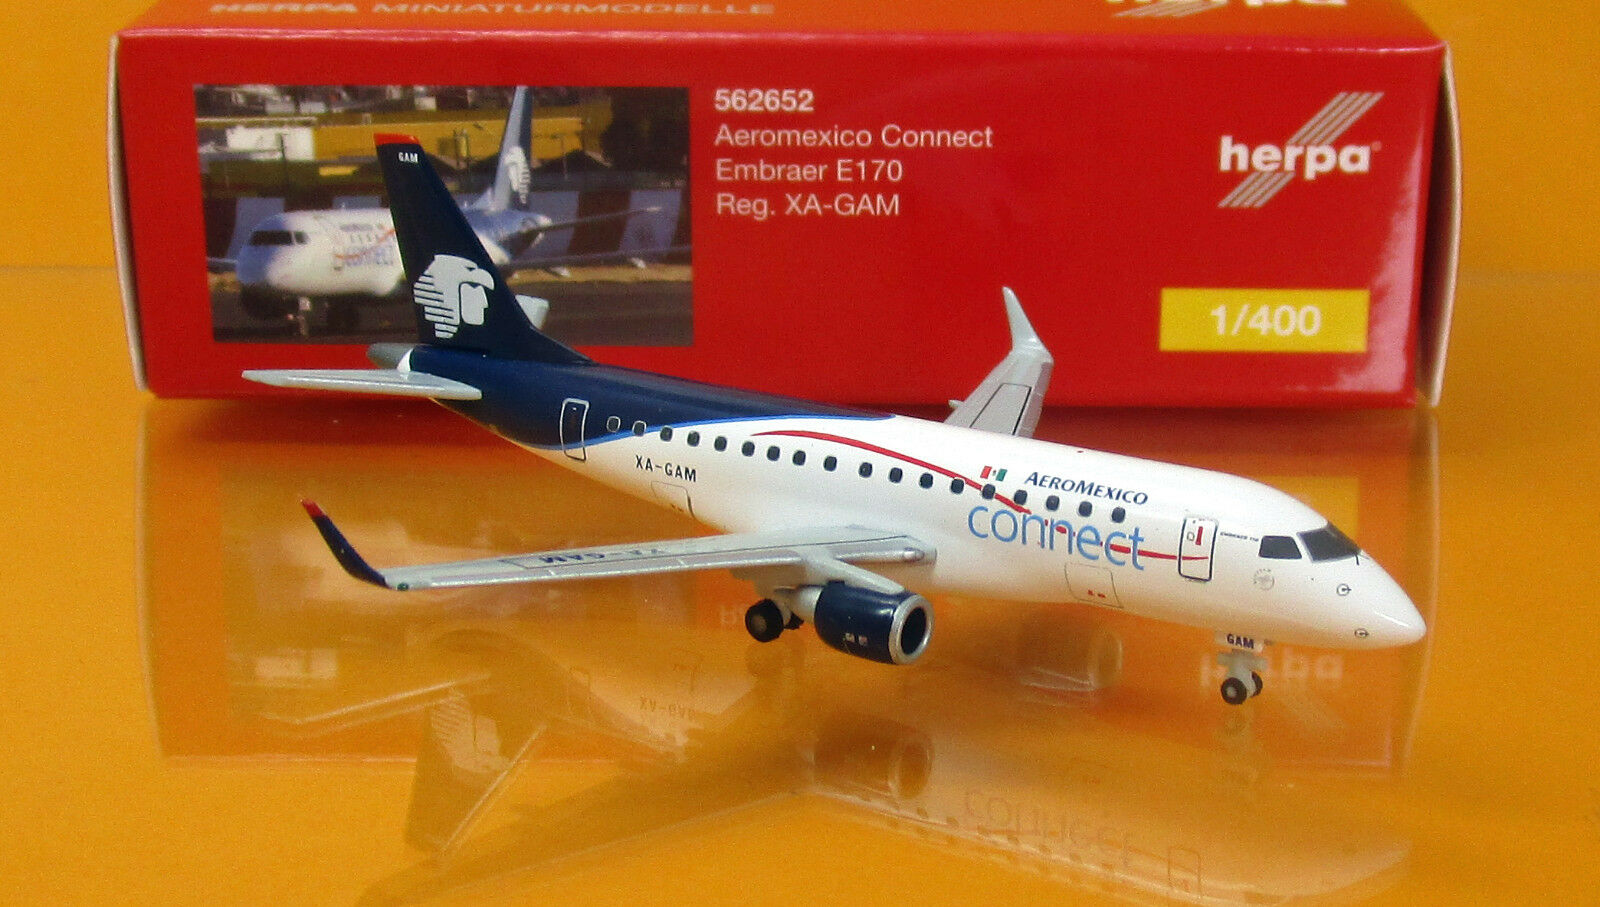 Herpa Wings 562652 Aeroméxico Connect Embraer E170 - XA-GAM Scale 1 400  | Erlesene Materialien